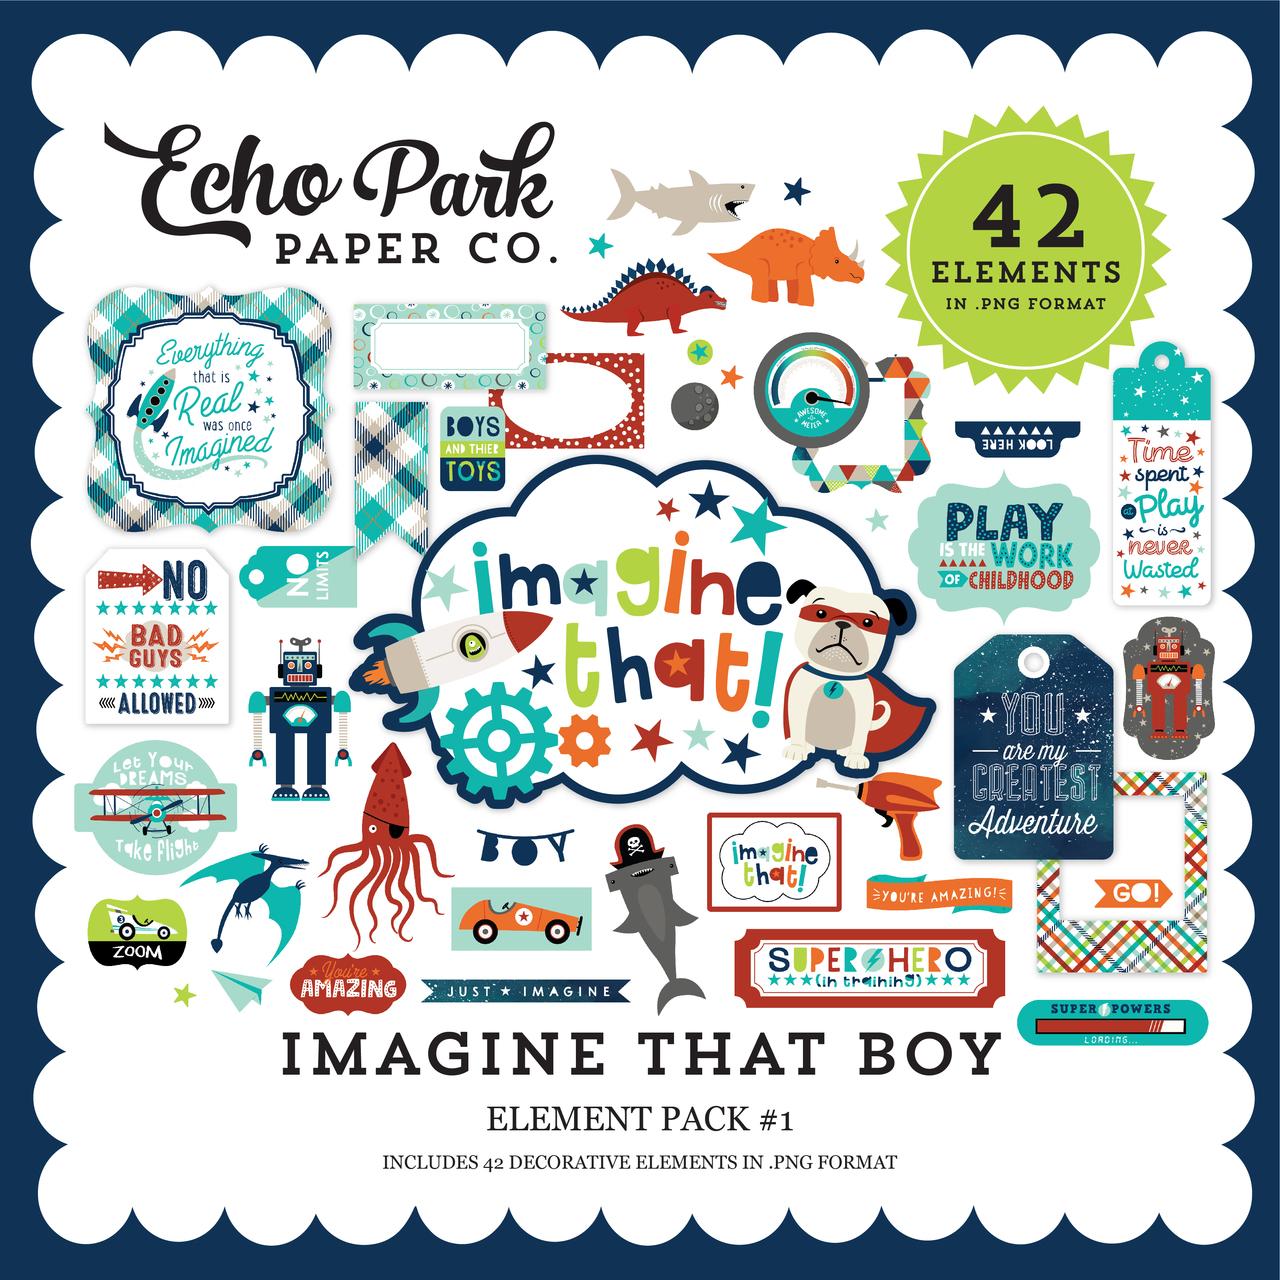 Imagine That Boy Element Pack #1